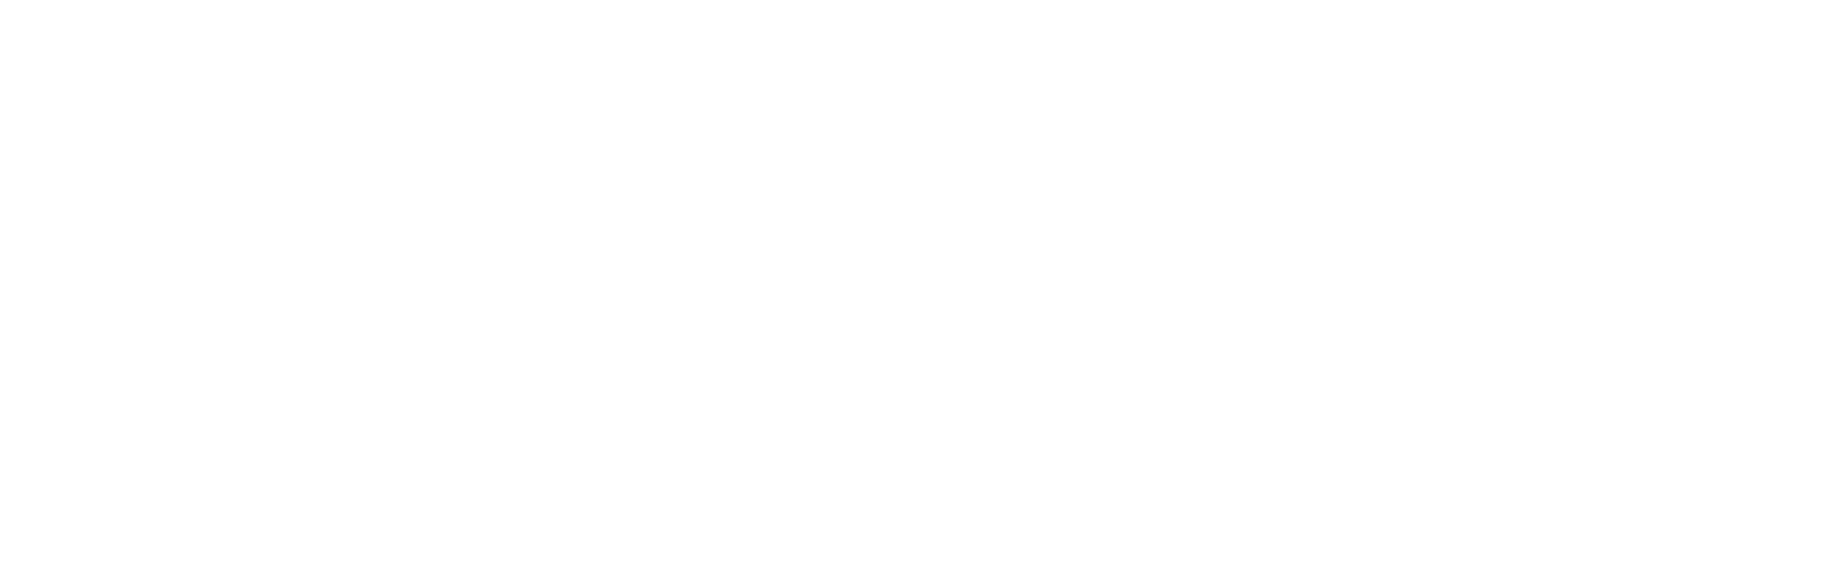 c_gradient_CareerEdVantage_white